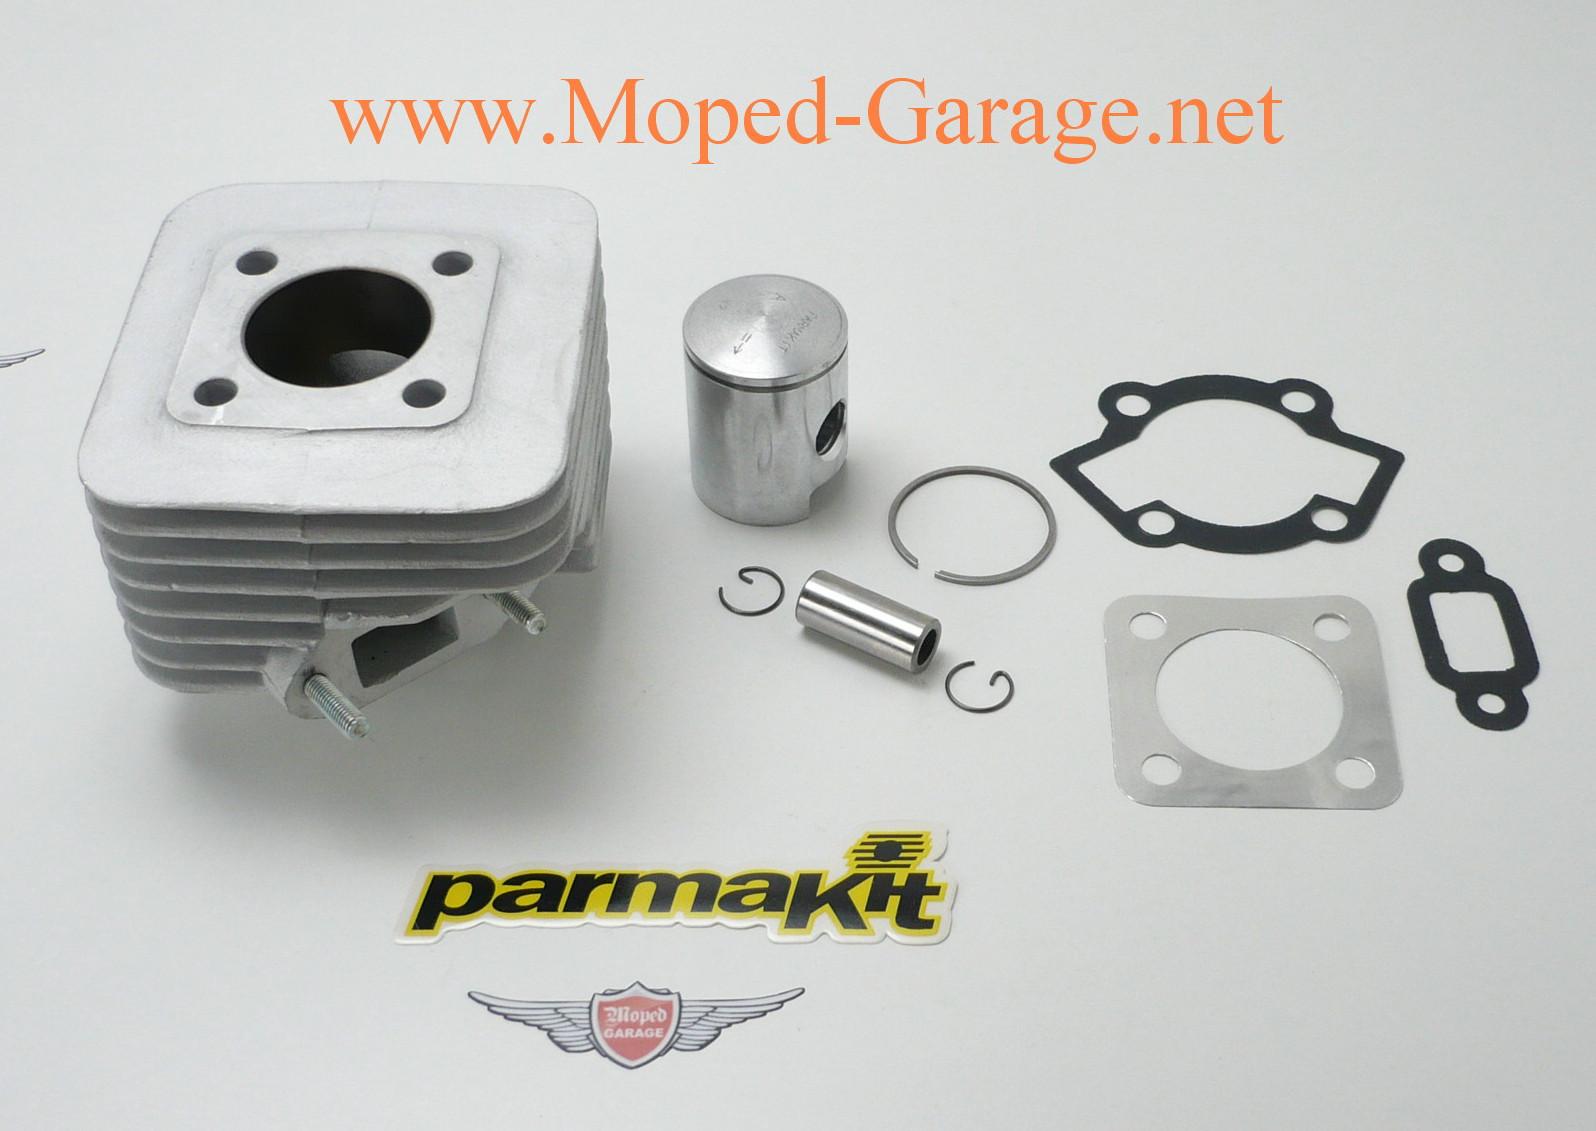 Moped Garage Net Kreidler Florett Eiertank Tm Gt Super